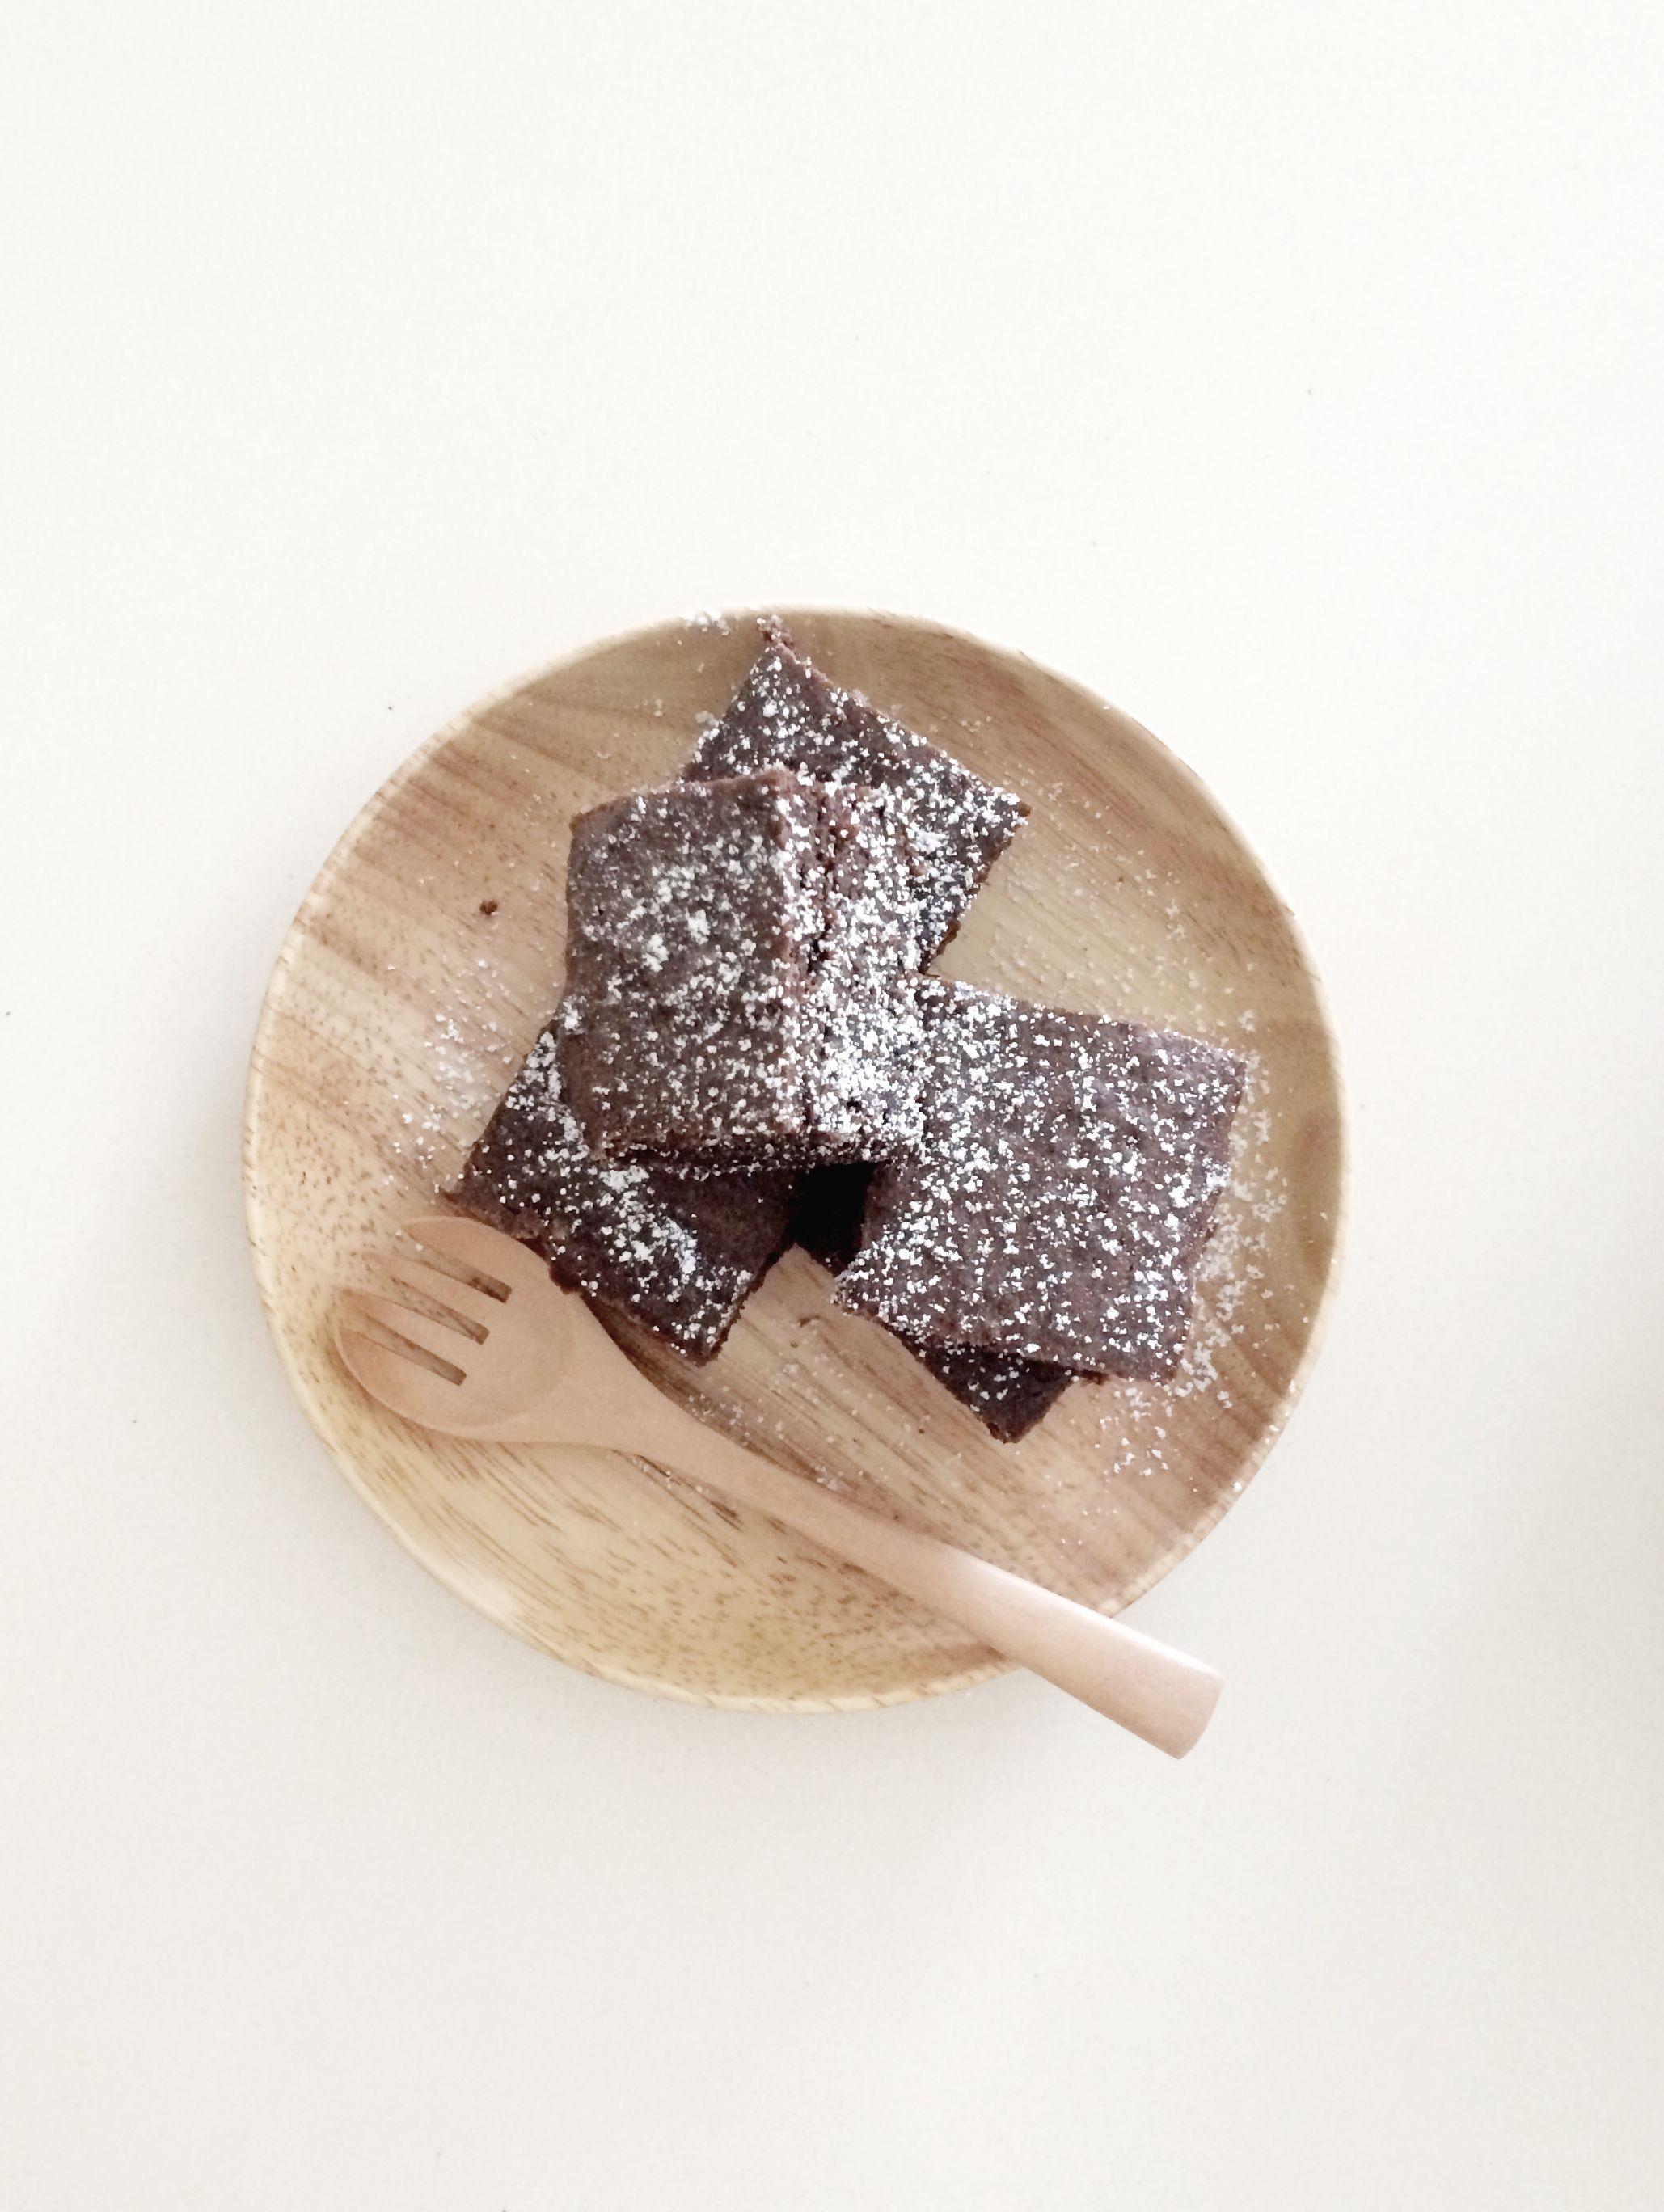 chocOlate & tofu brownies